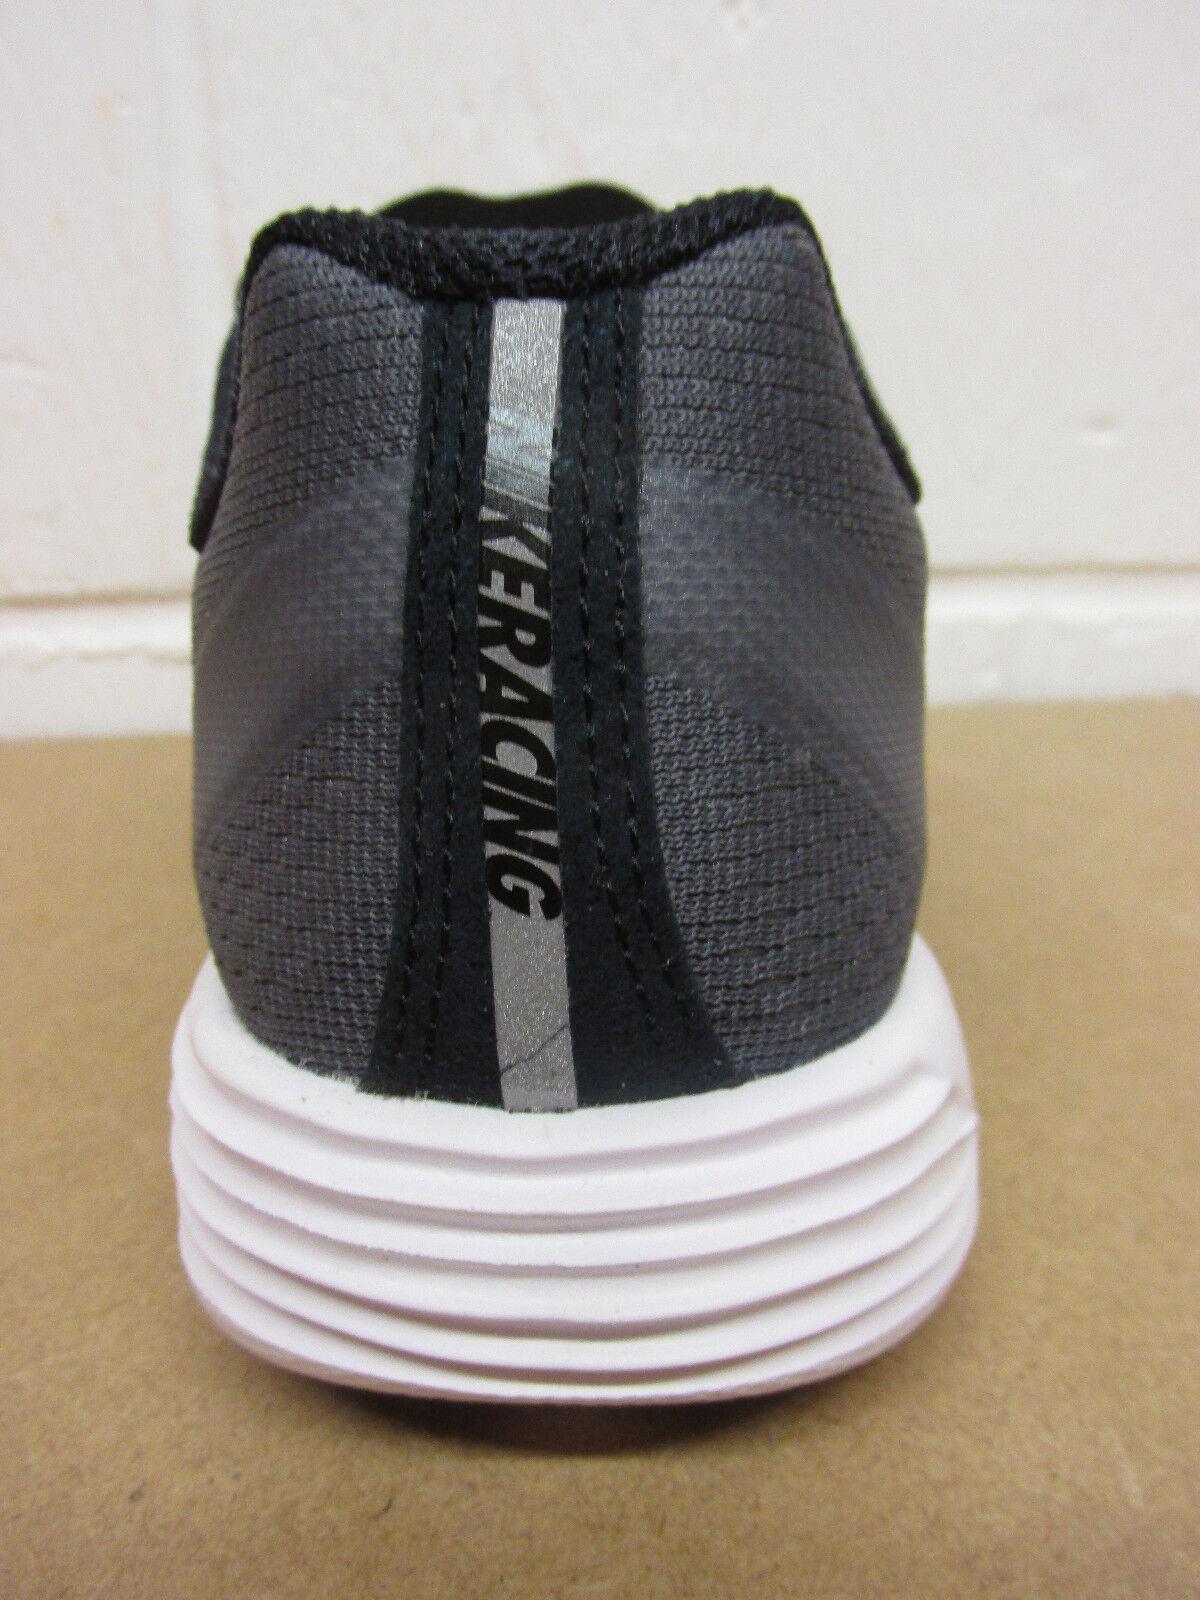 Nike trainers lunaracer+ 3 Damenss running trainers Nike 554683 010 Turnschuhe schuhe 3da598